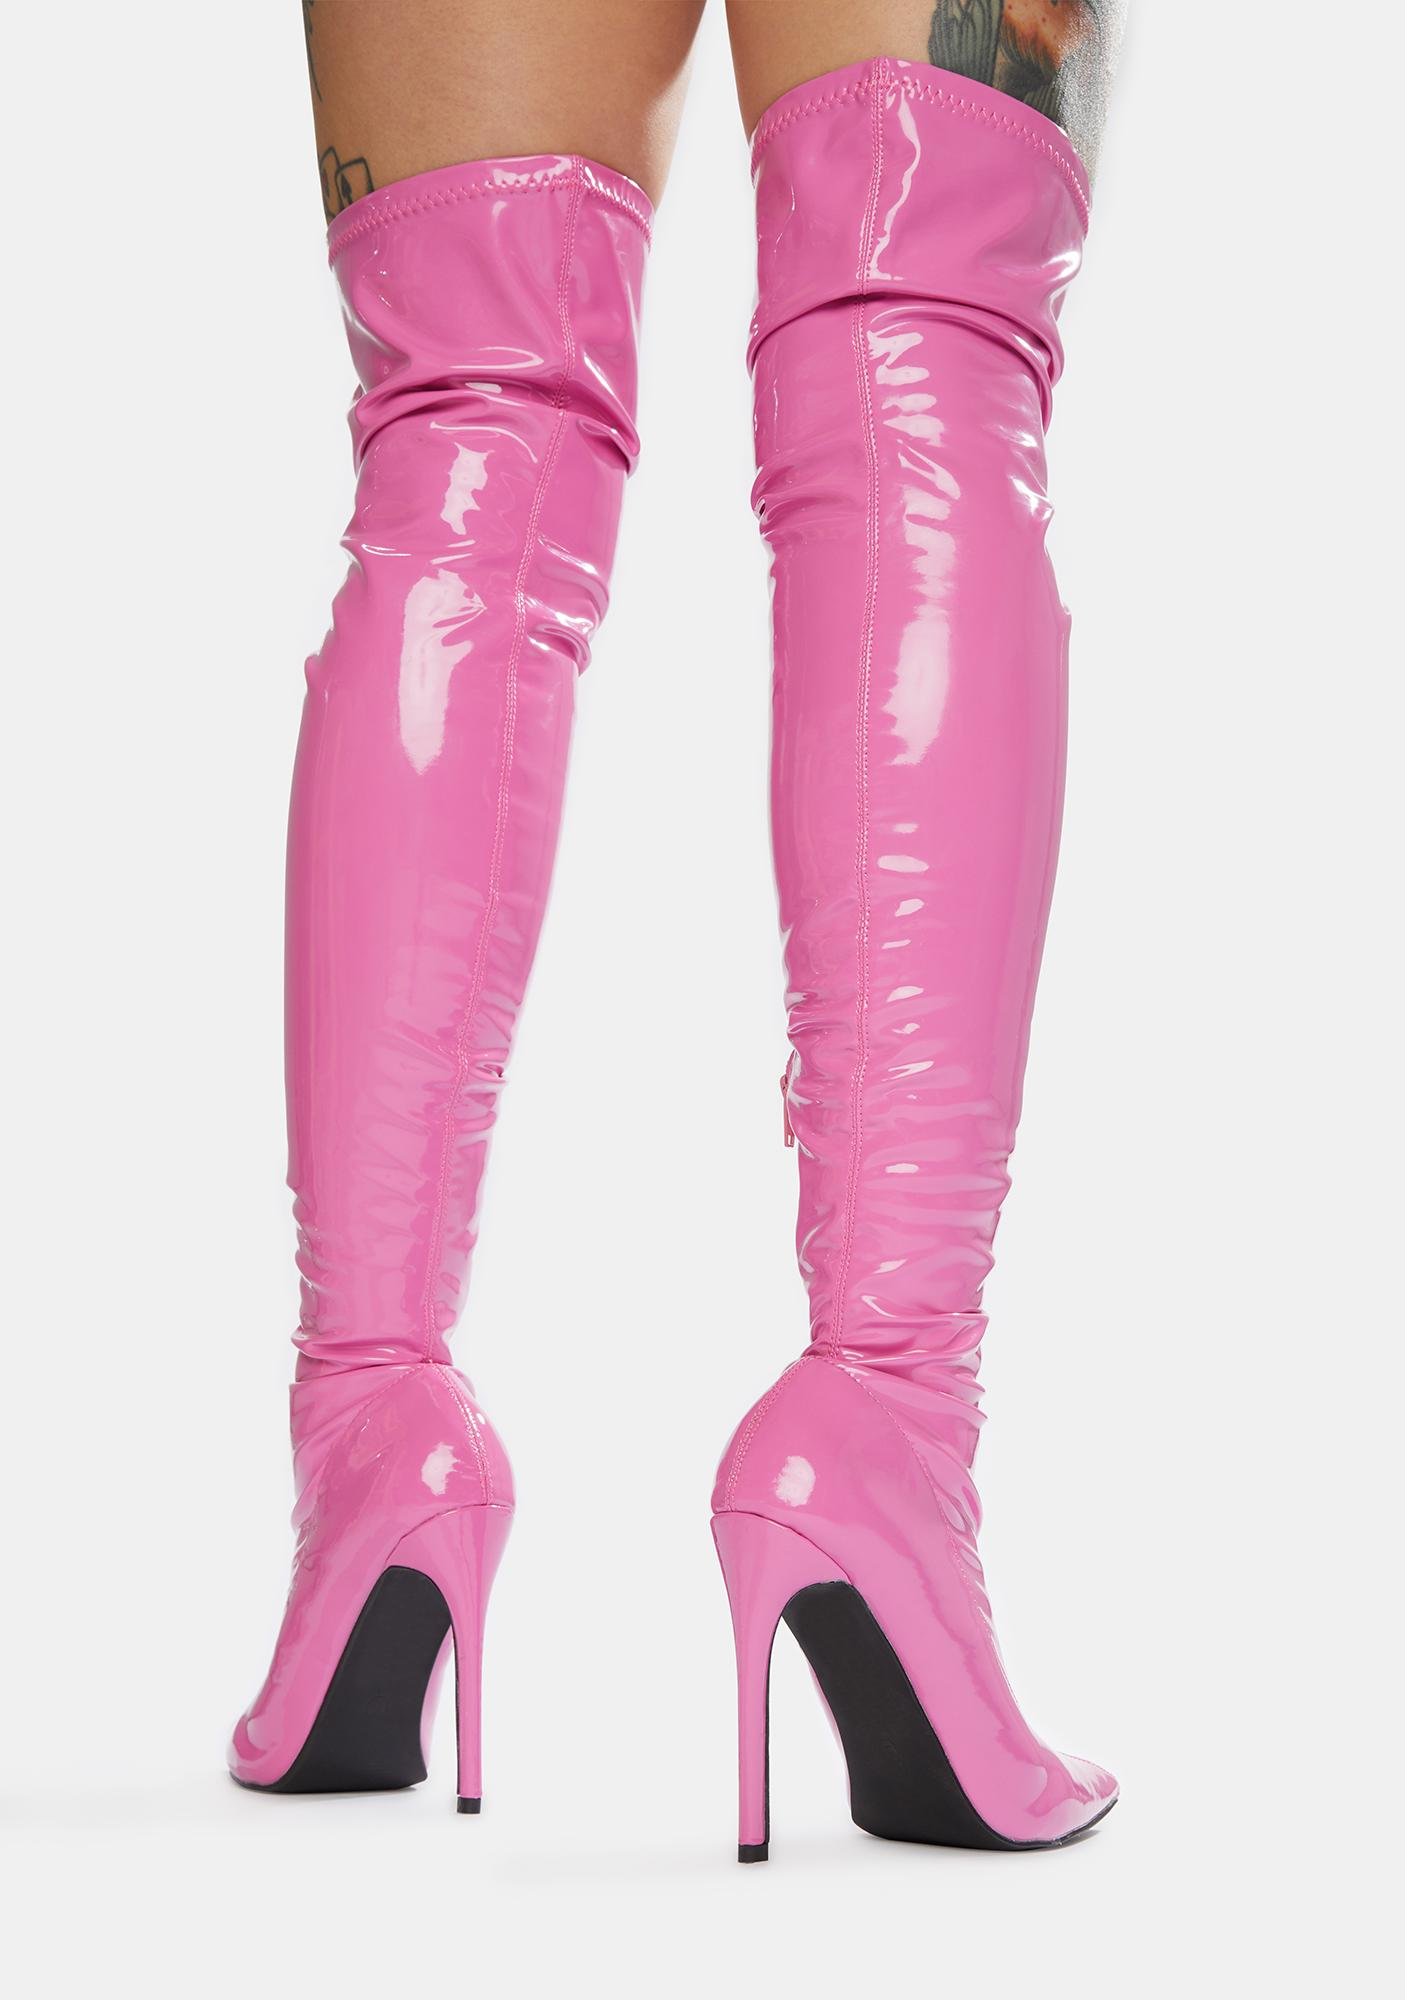 Public Desire Pink Confidence Patent Stiletto Boots